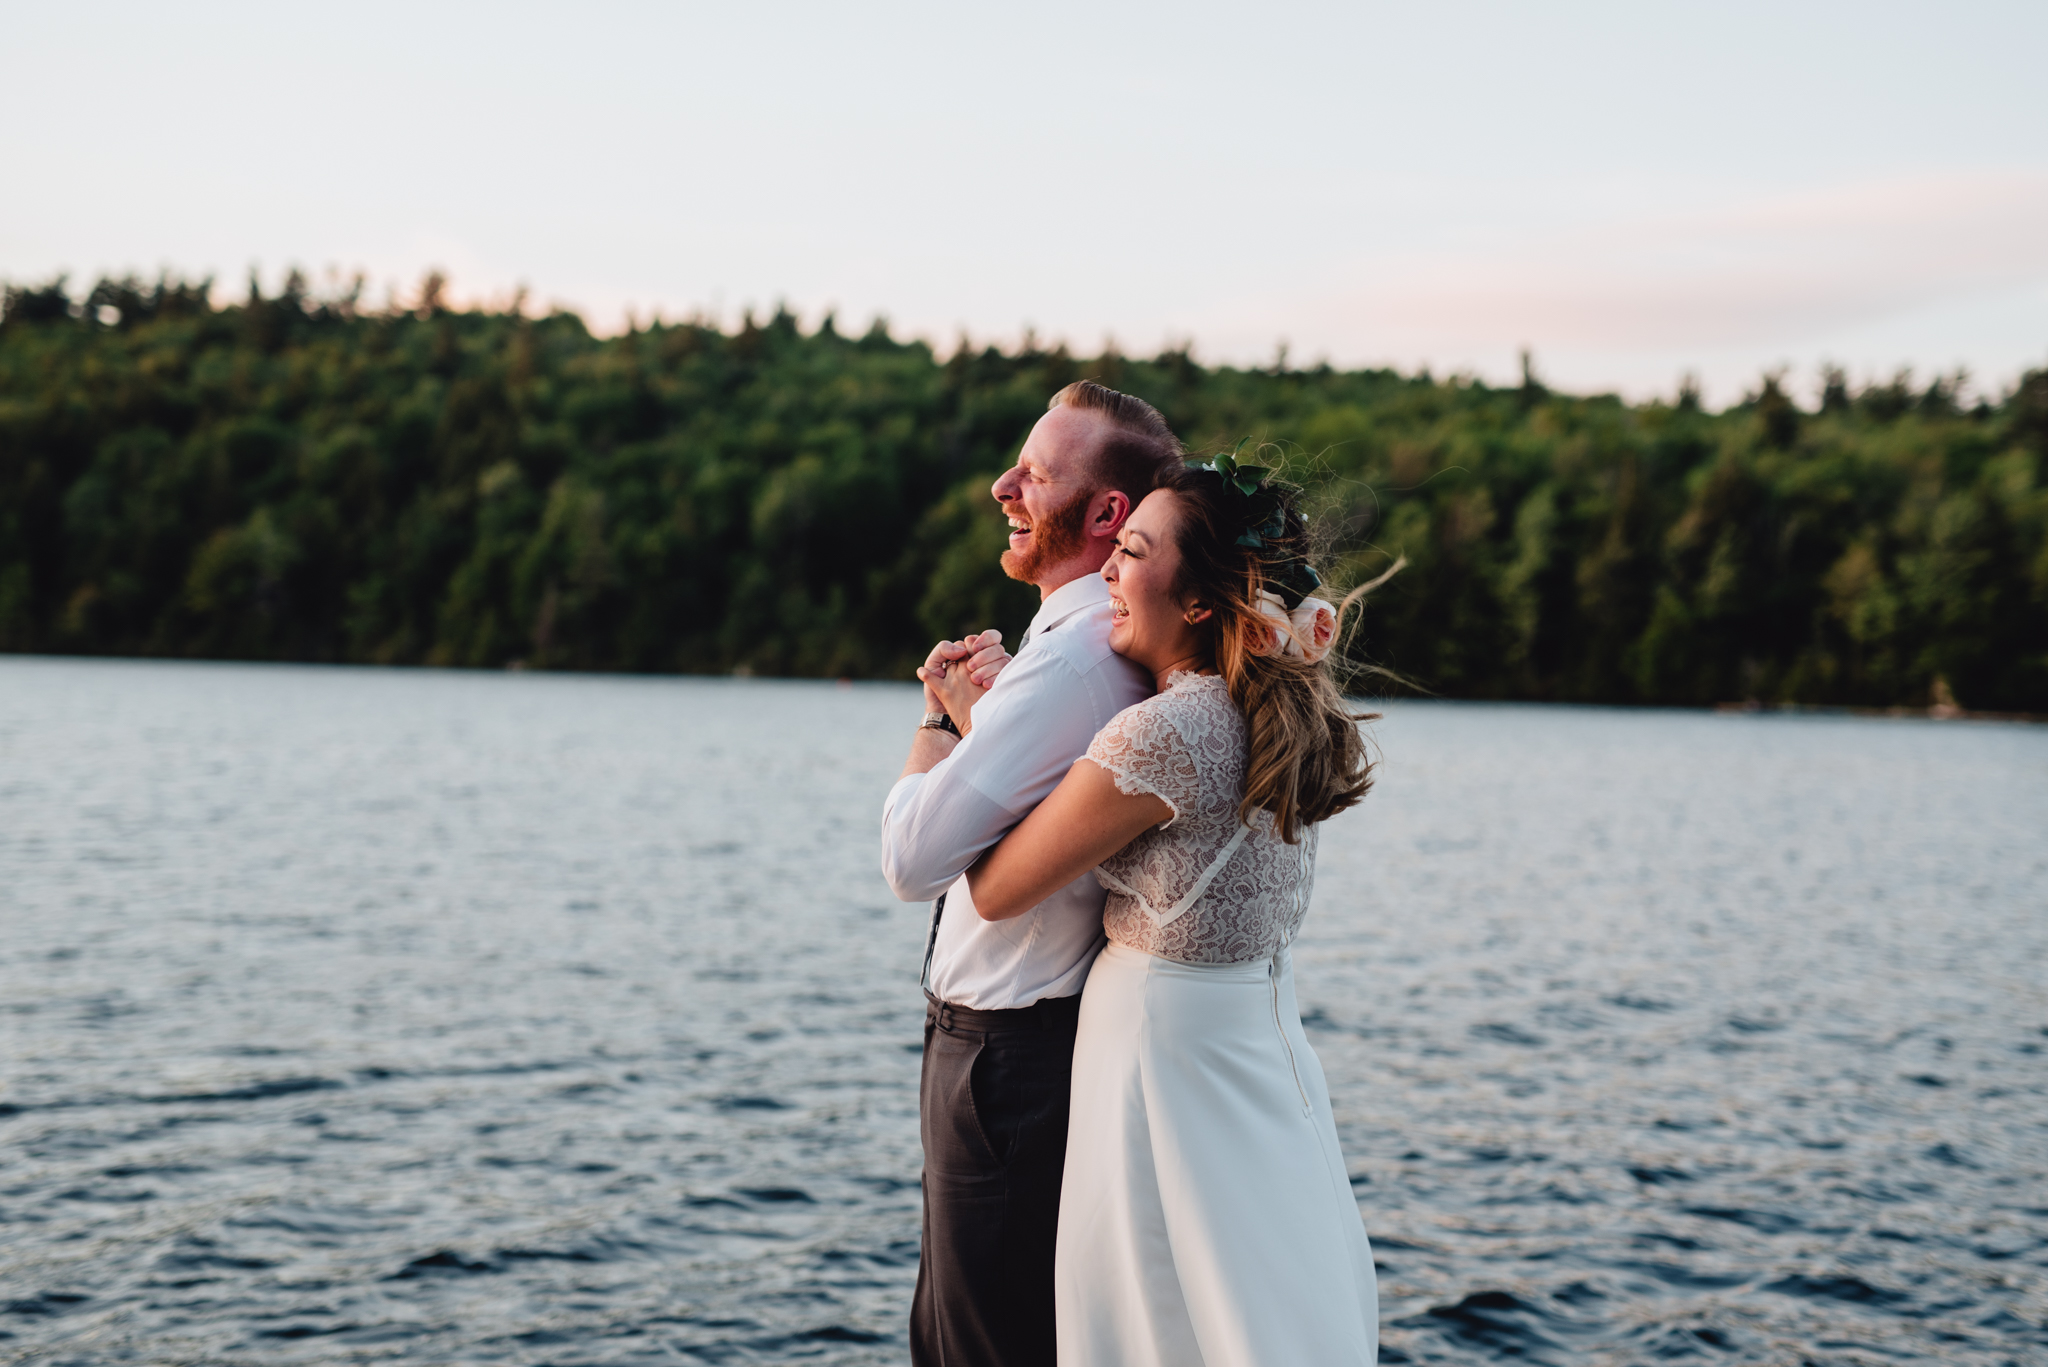 Summer Camp Wedding Photography June 2017 Massachusetts Berkshires Outdoor Wedding Photography Novella Photography Matt and Paulette Griswold (160).jpg